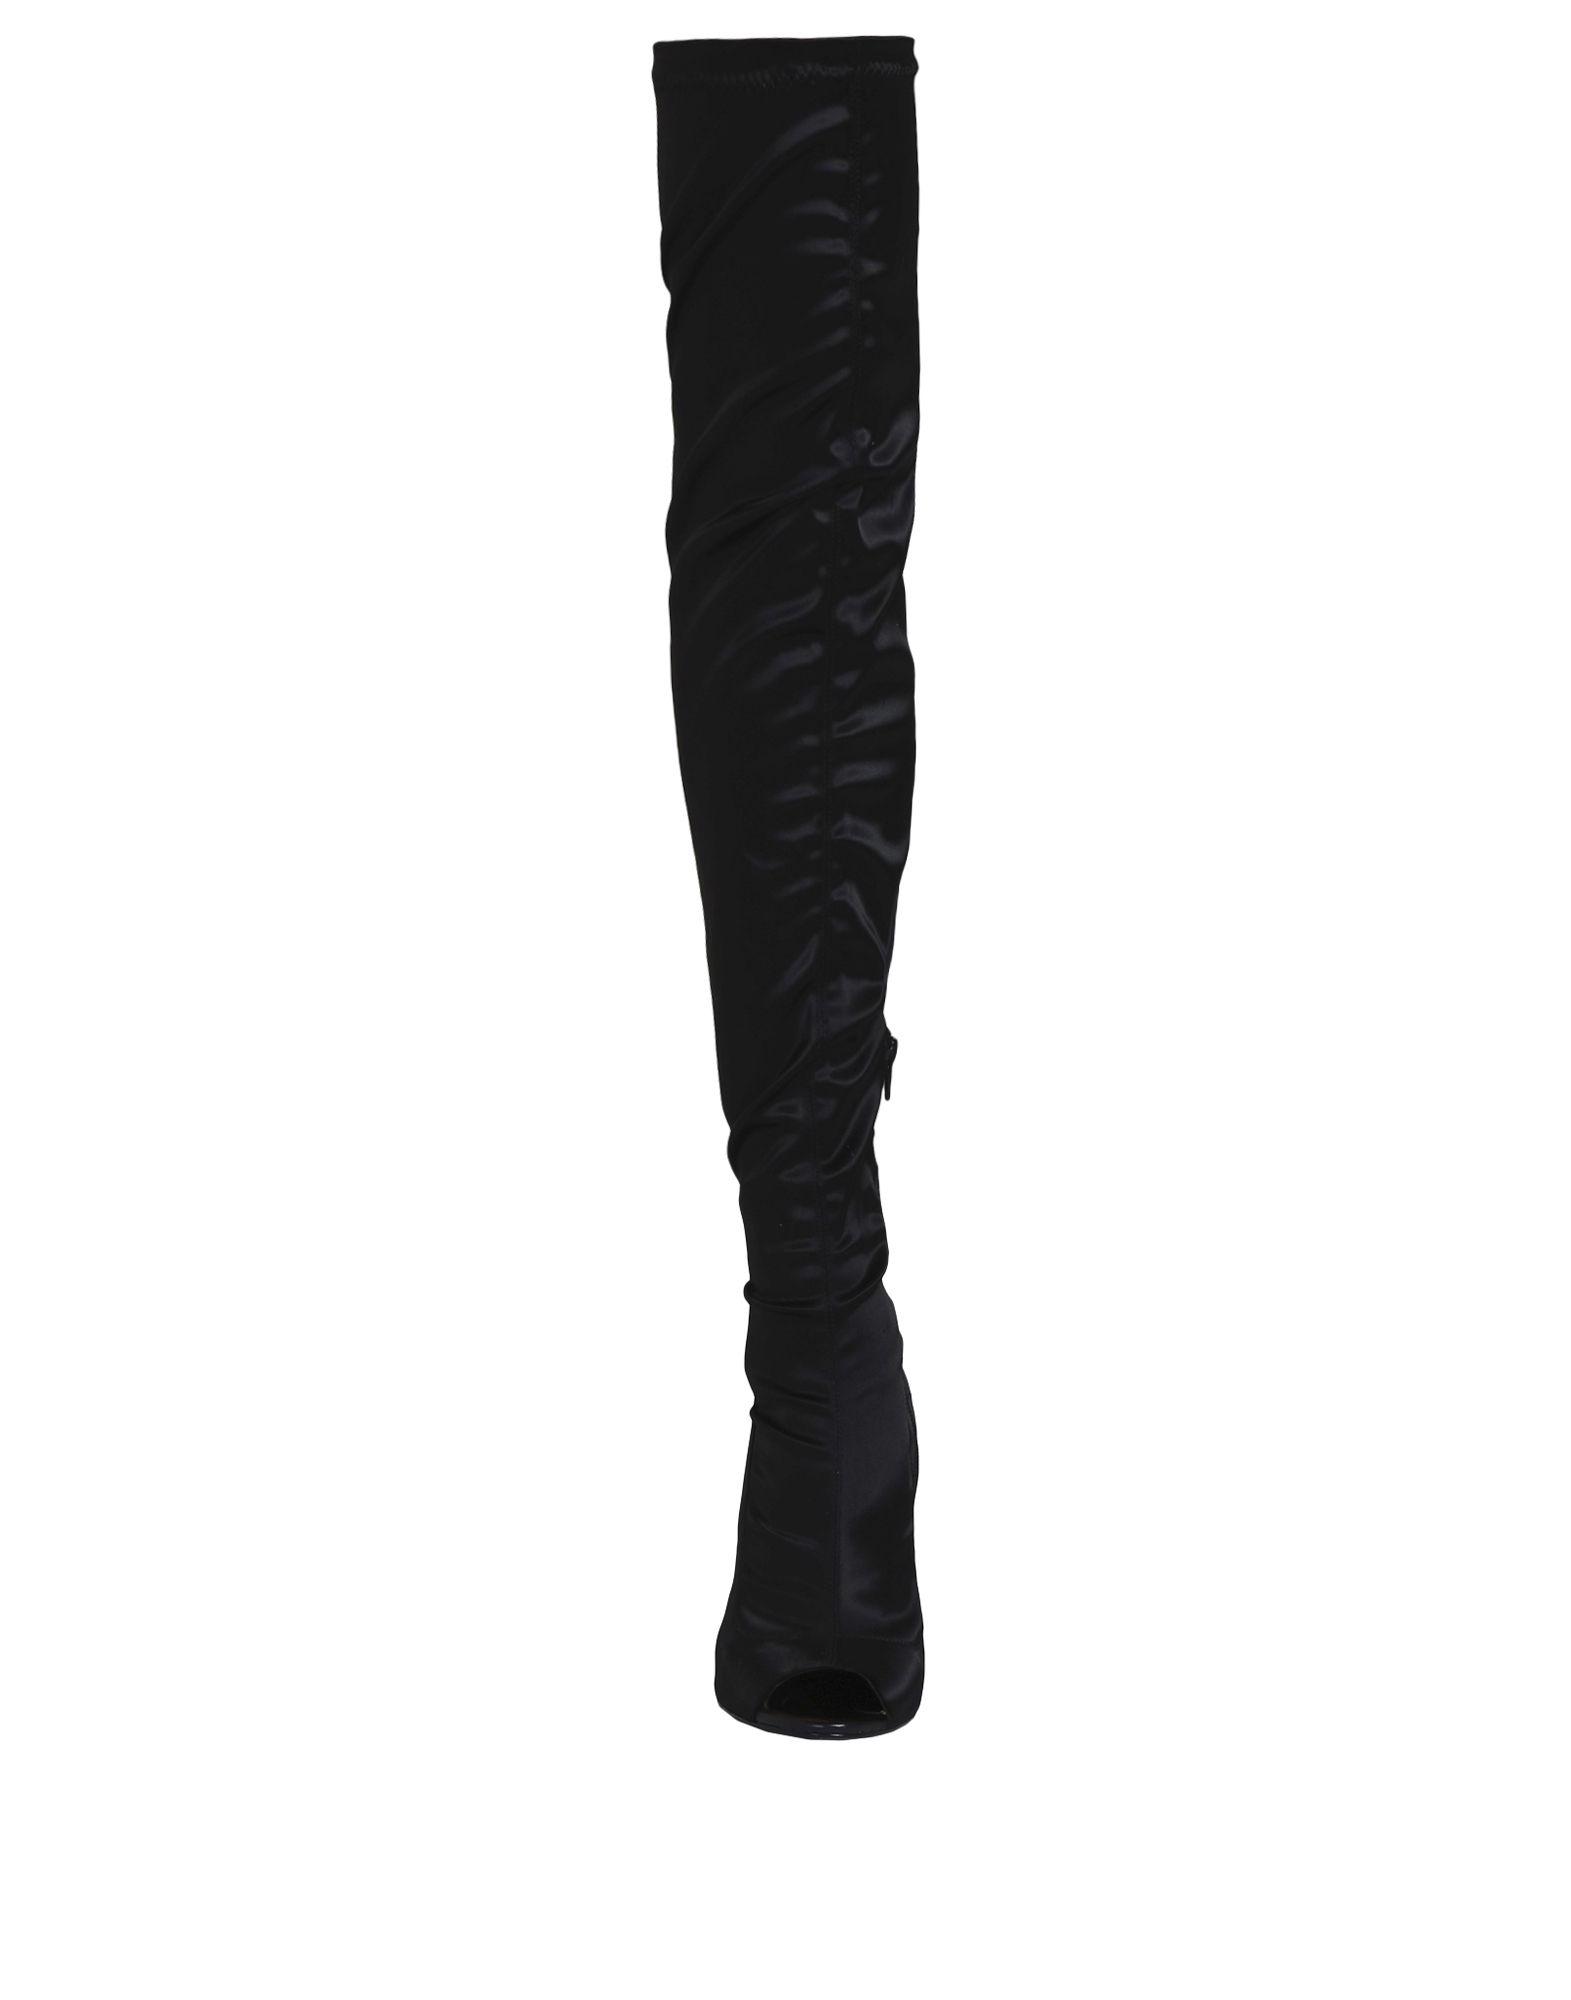 Jolie By Edward Spiers Stiefel Damen Gute  11452118OH Gute Damen Qualität beliebte Schuhe d9cf22